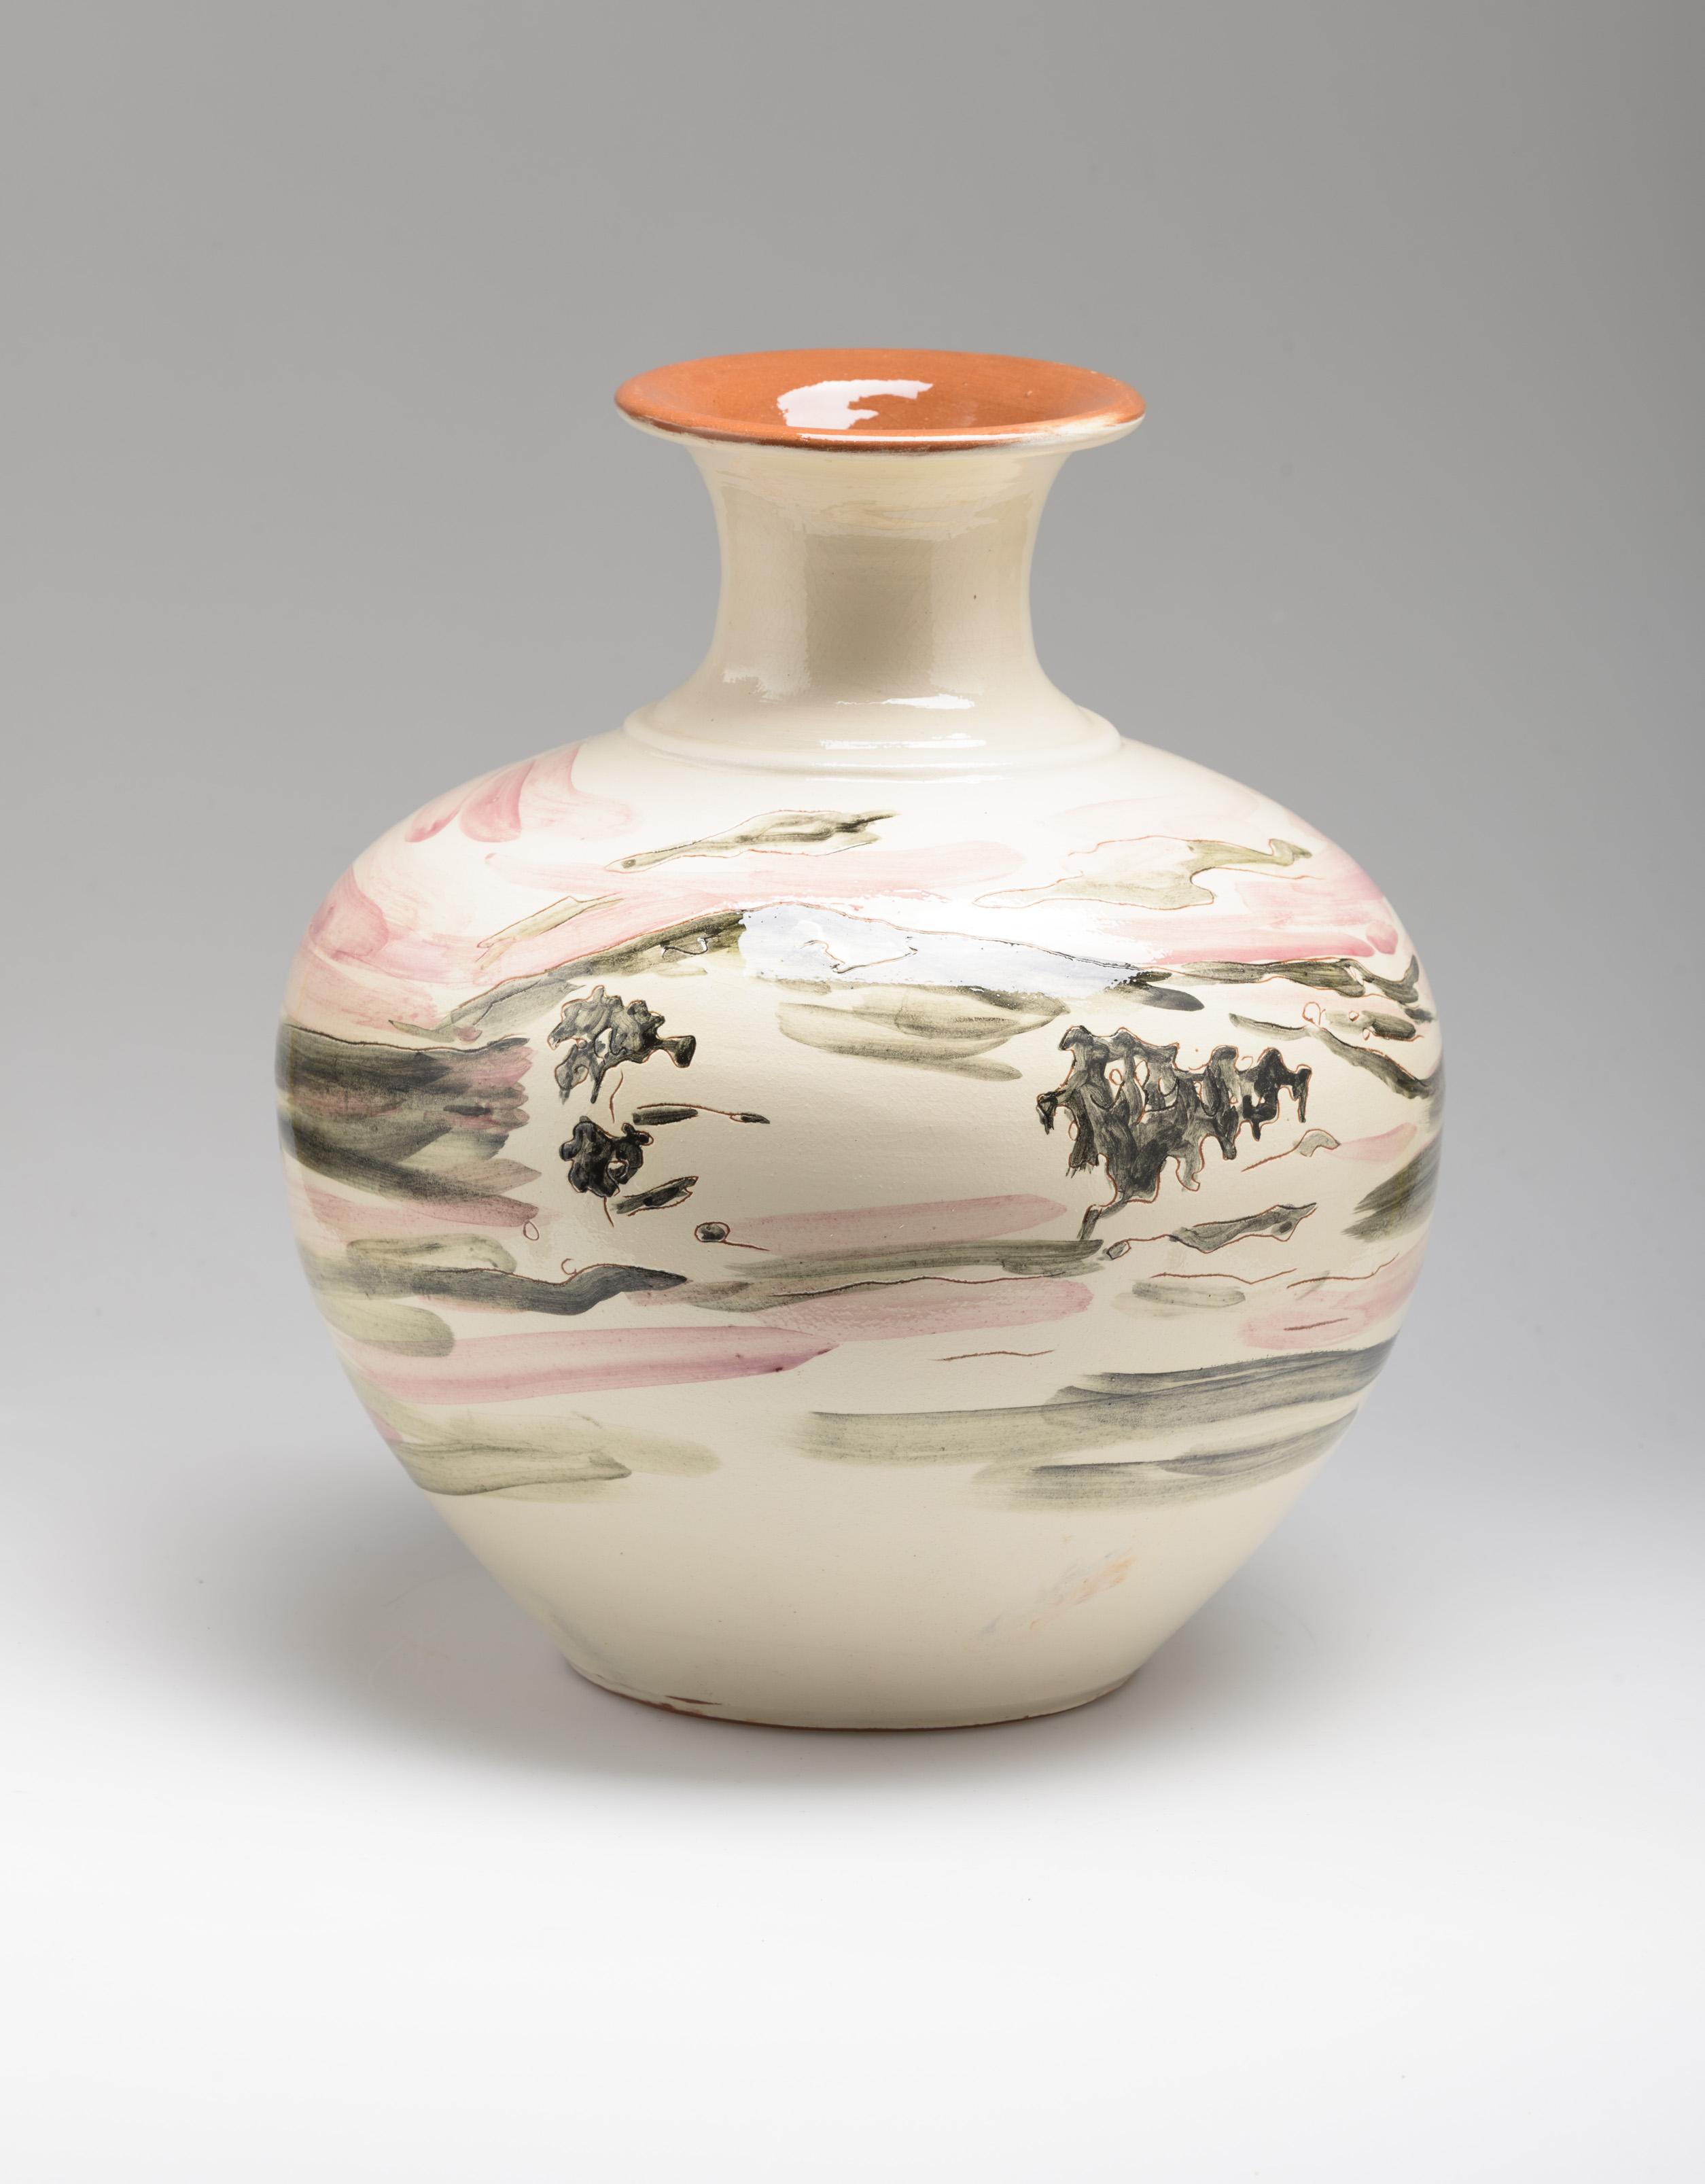 Ceramic Flower Vase Portugal 29 cm. high Portugal 2015